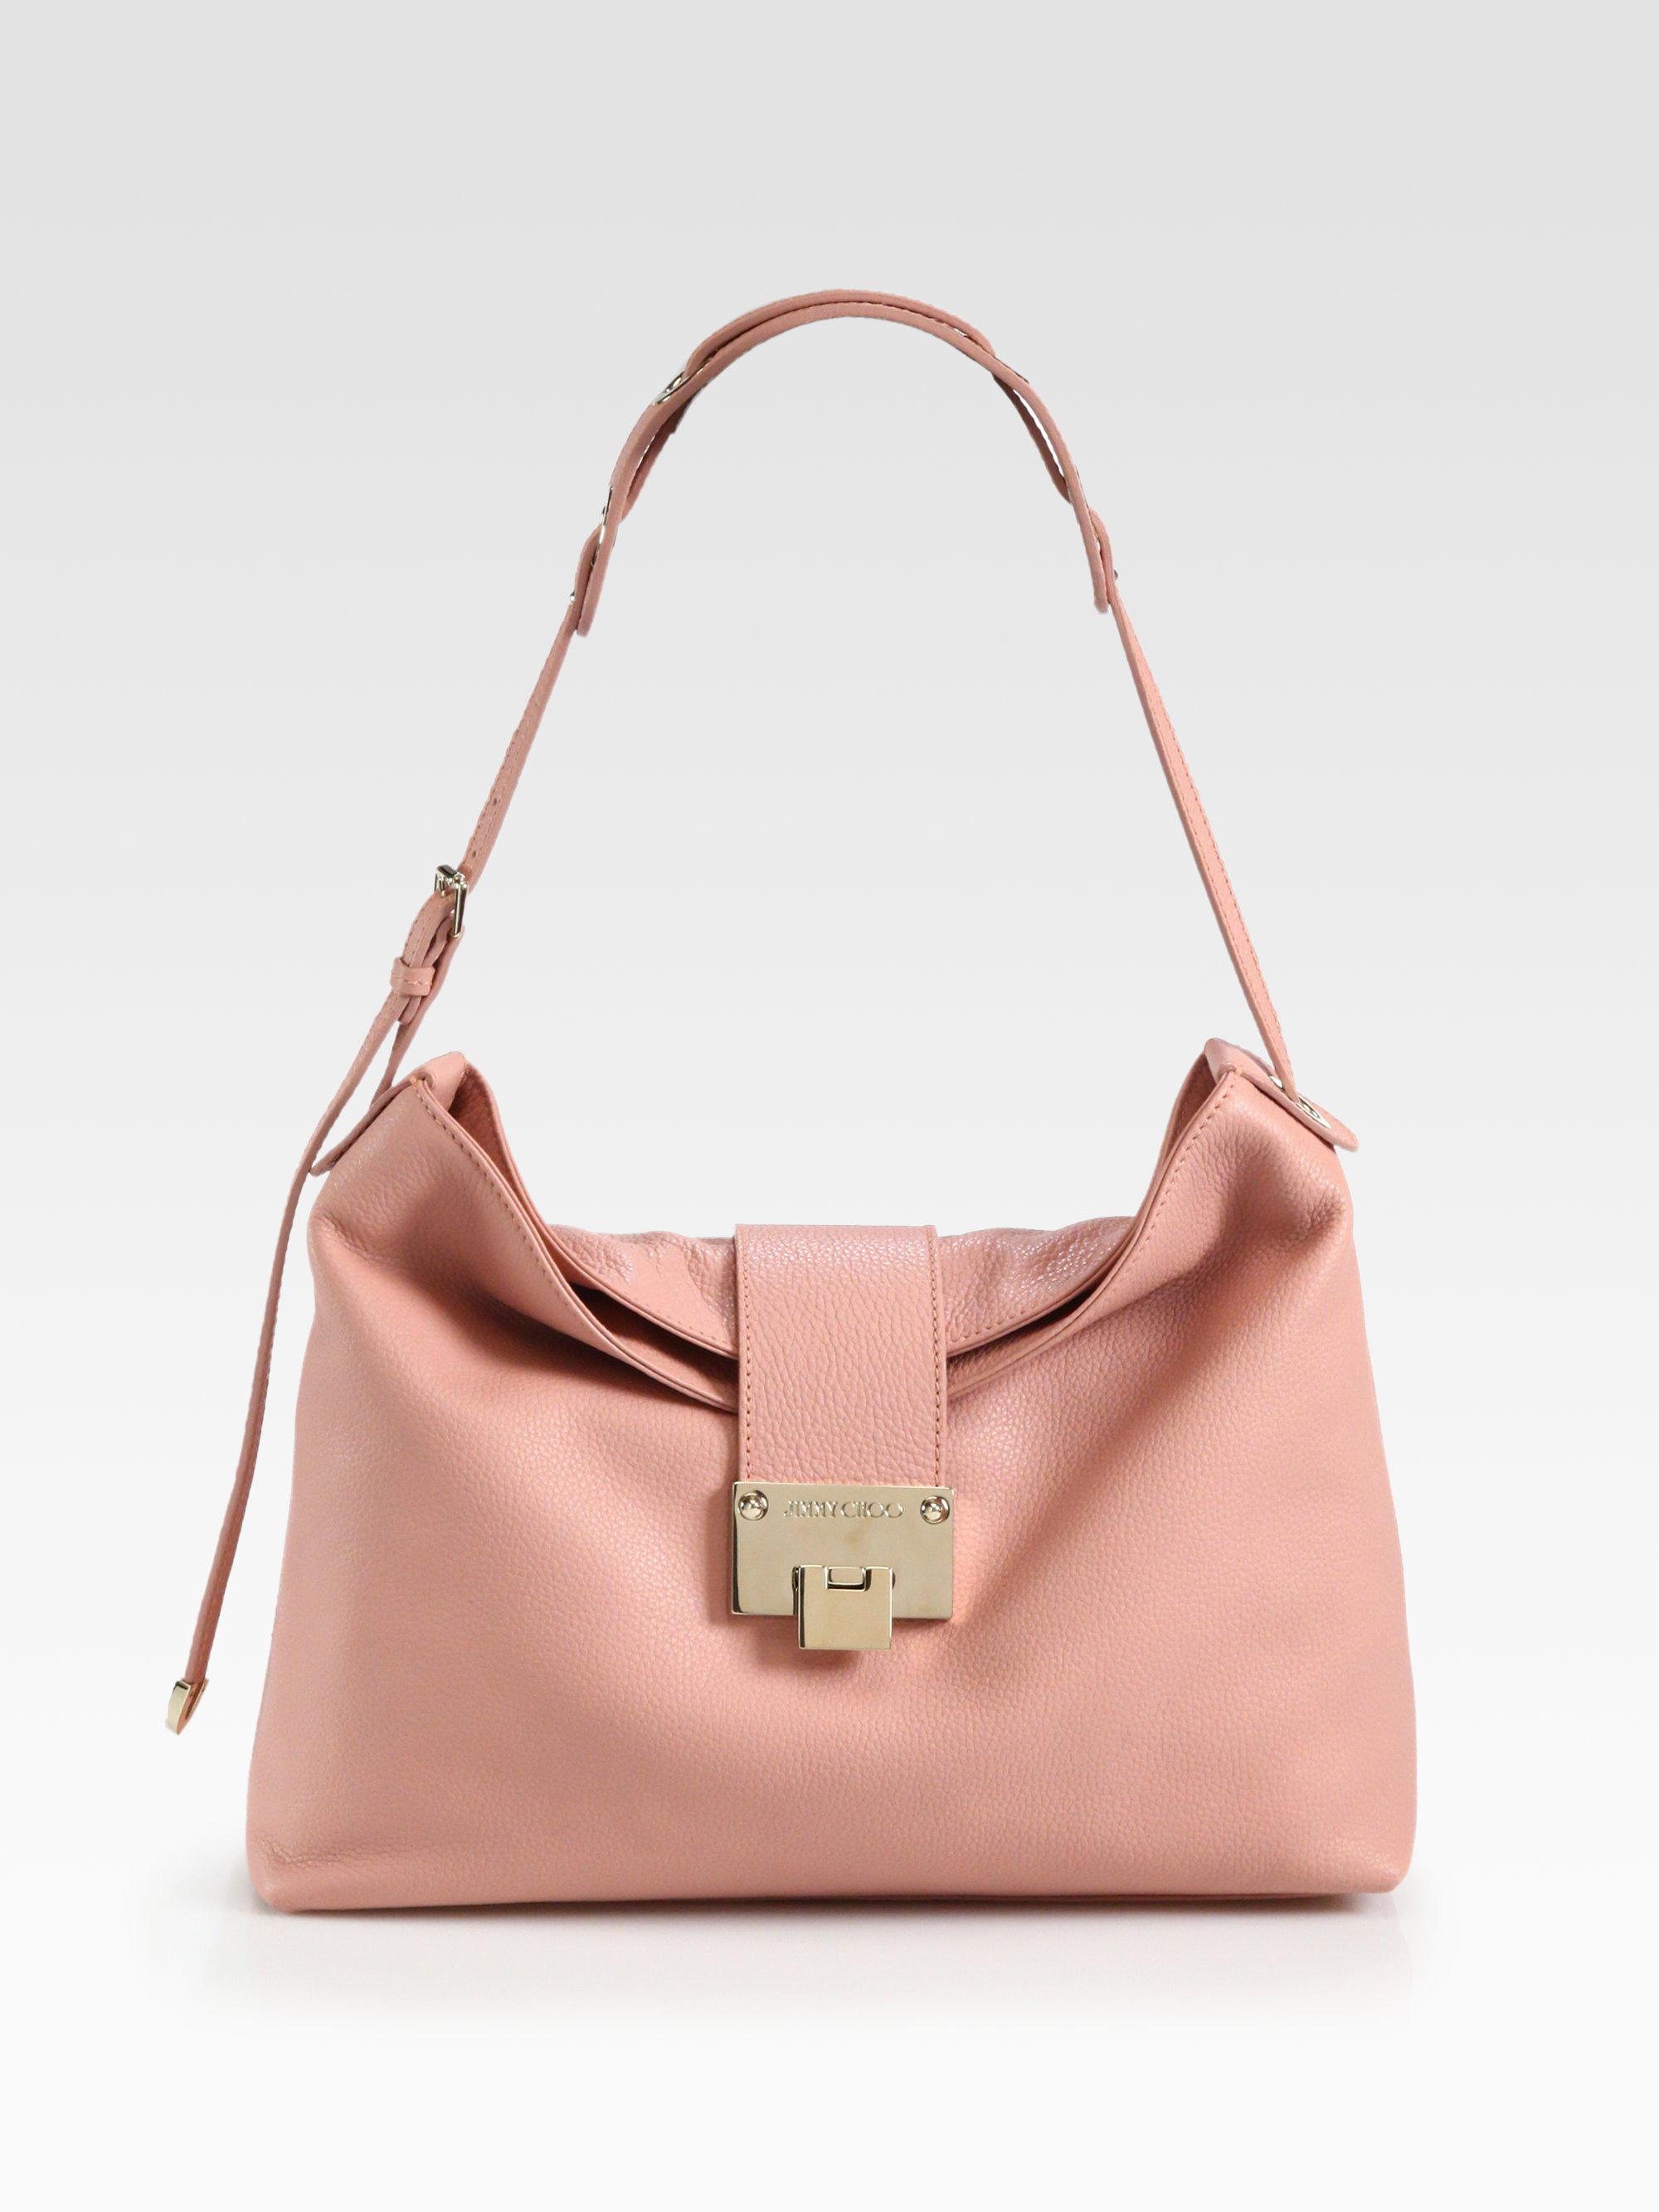 2ef1ec6da38 Lyst - Jimmy Choo Rachel Grainy Calf Leather Shoulder Bag in Pink